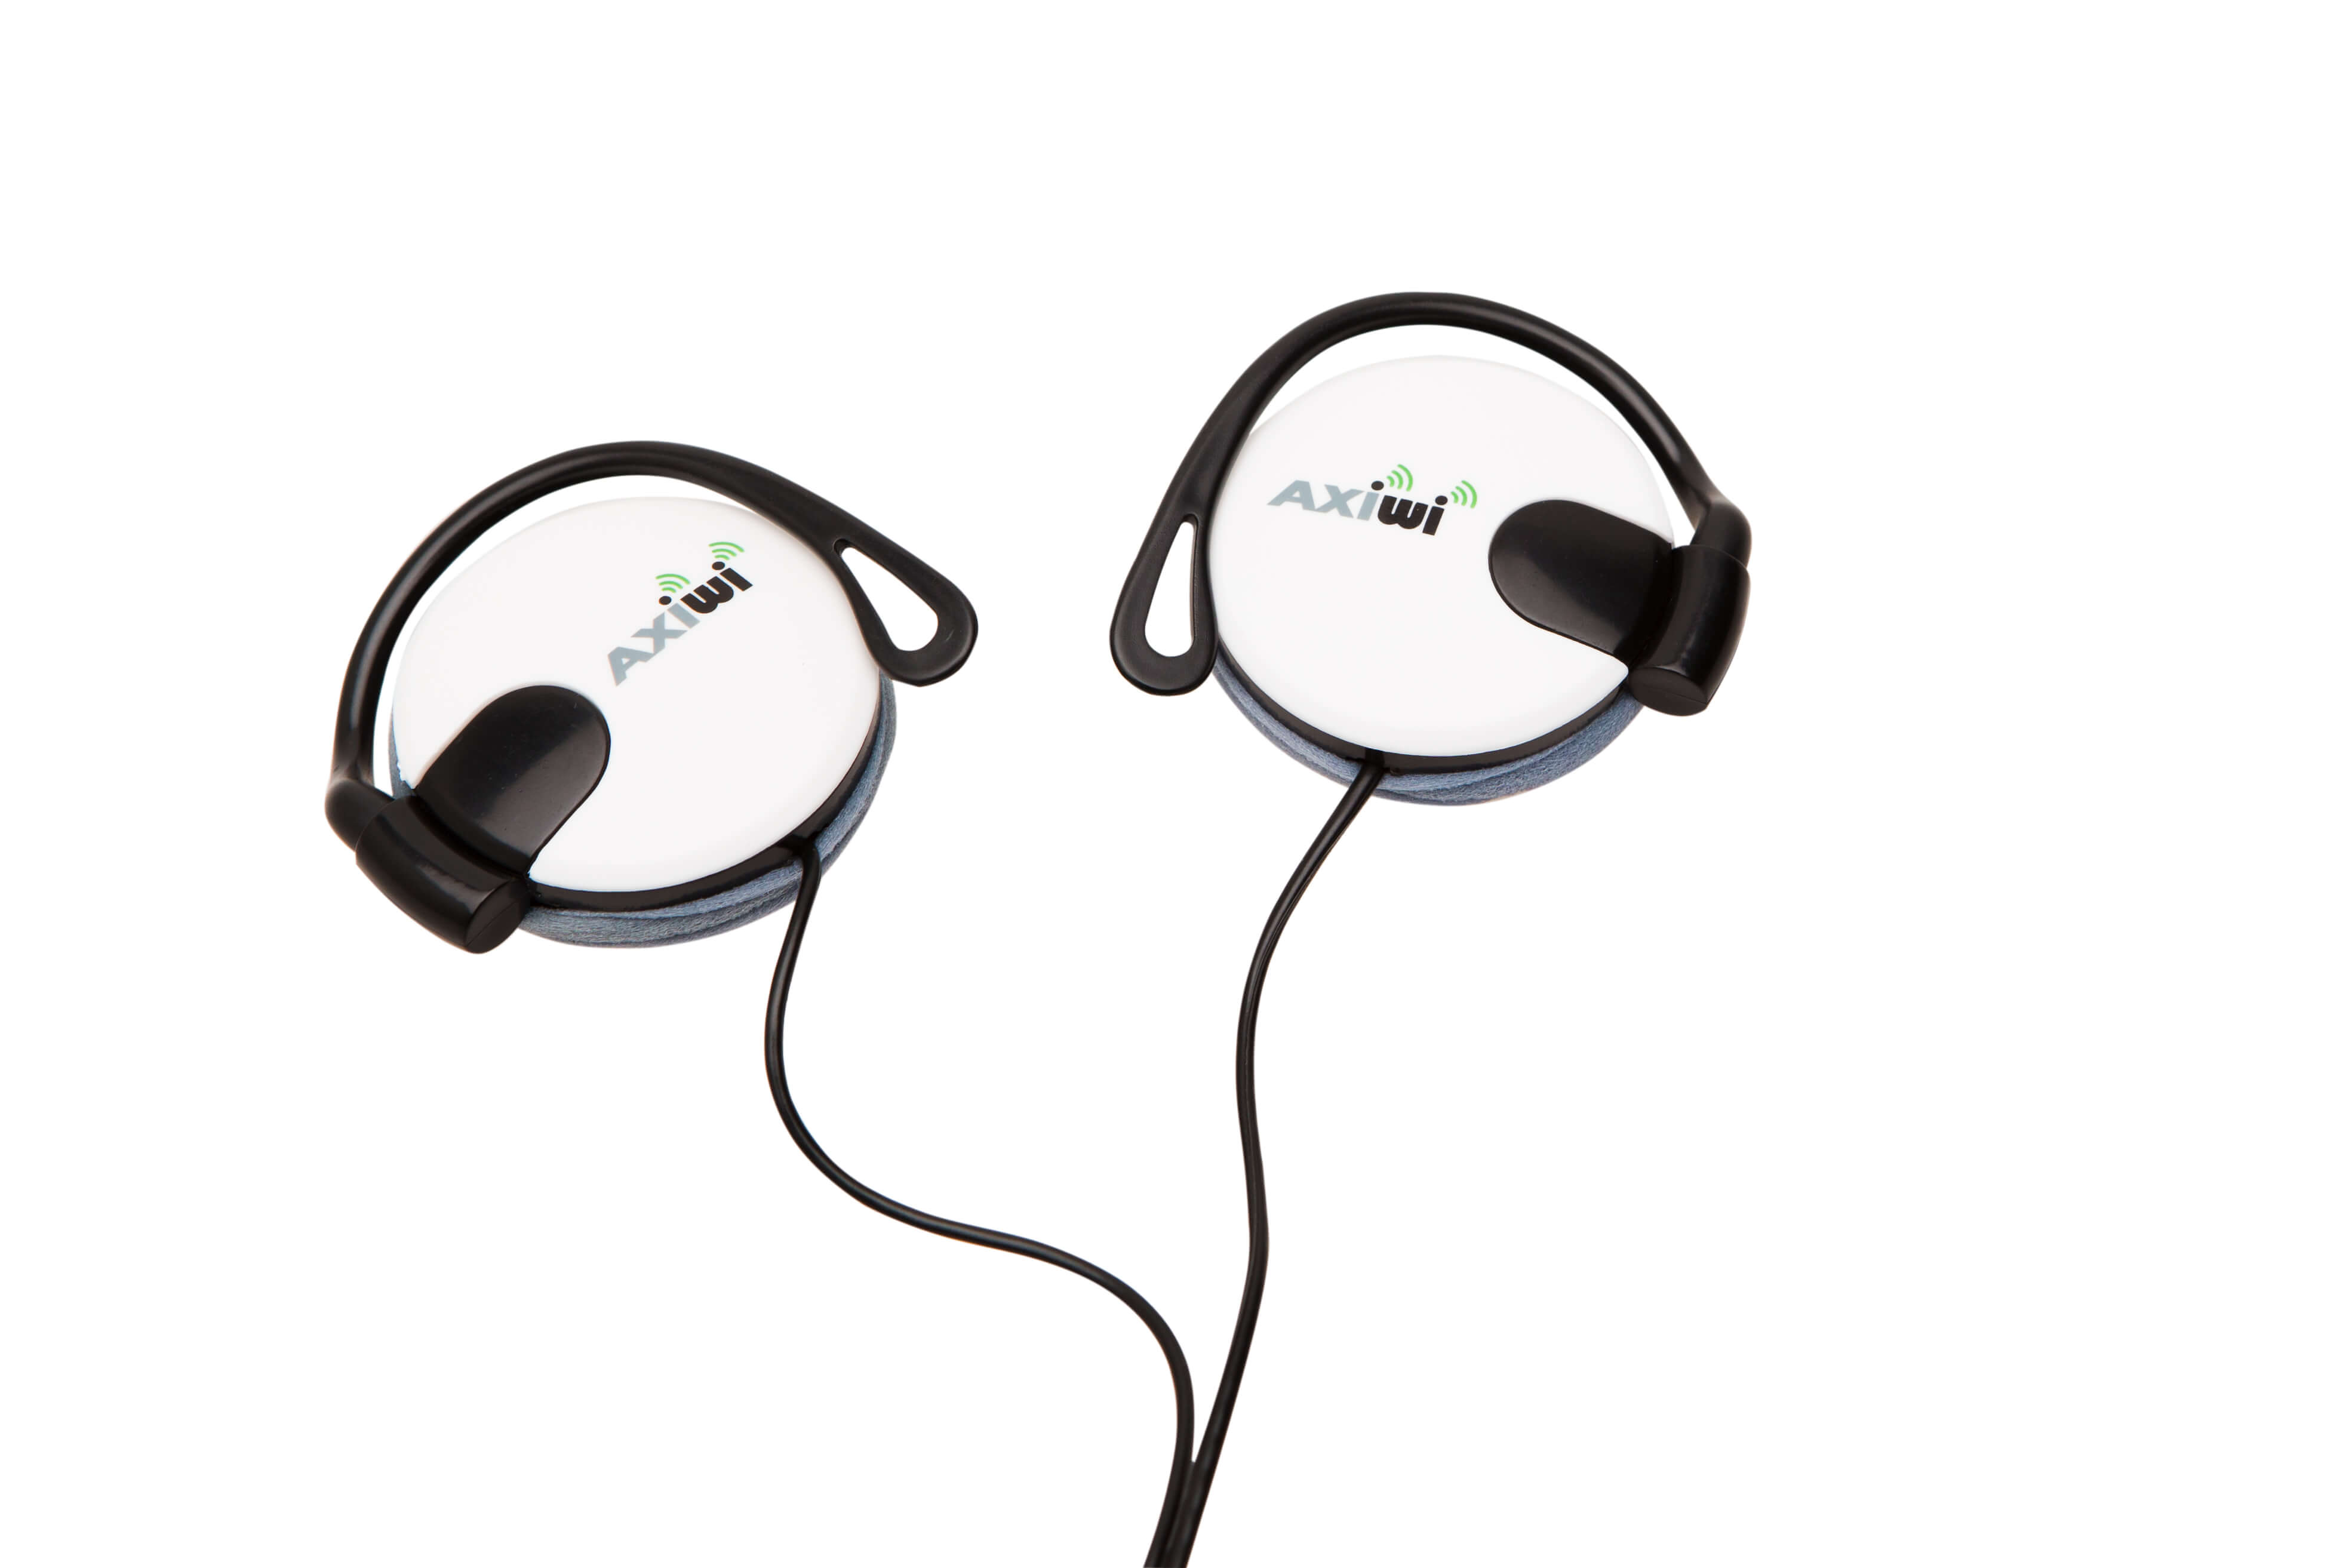 axitour-axiwi-ea-004-earclip-earphone